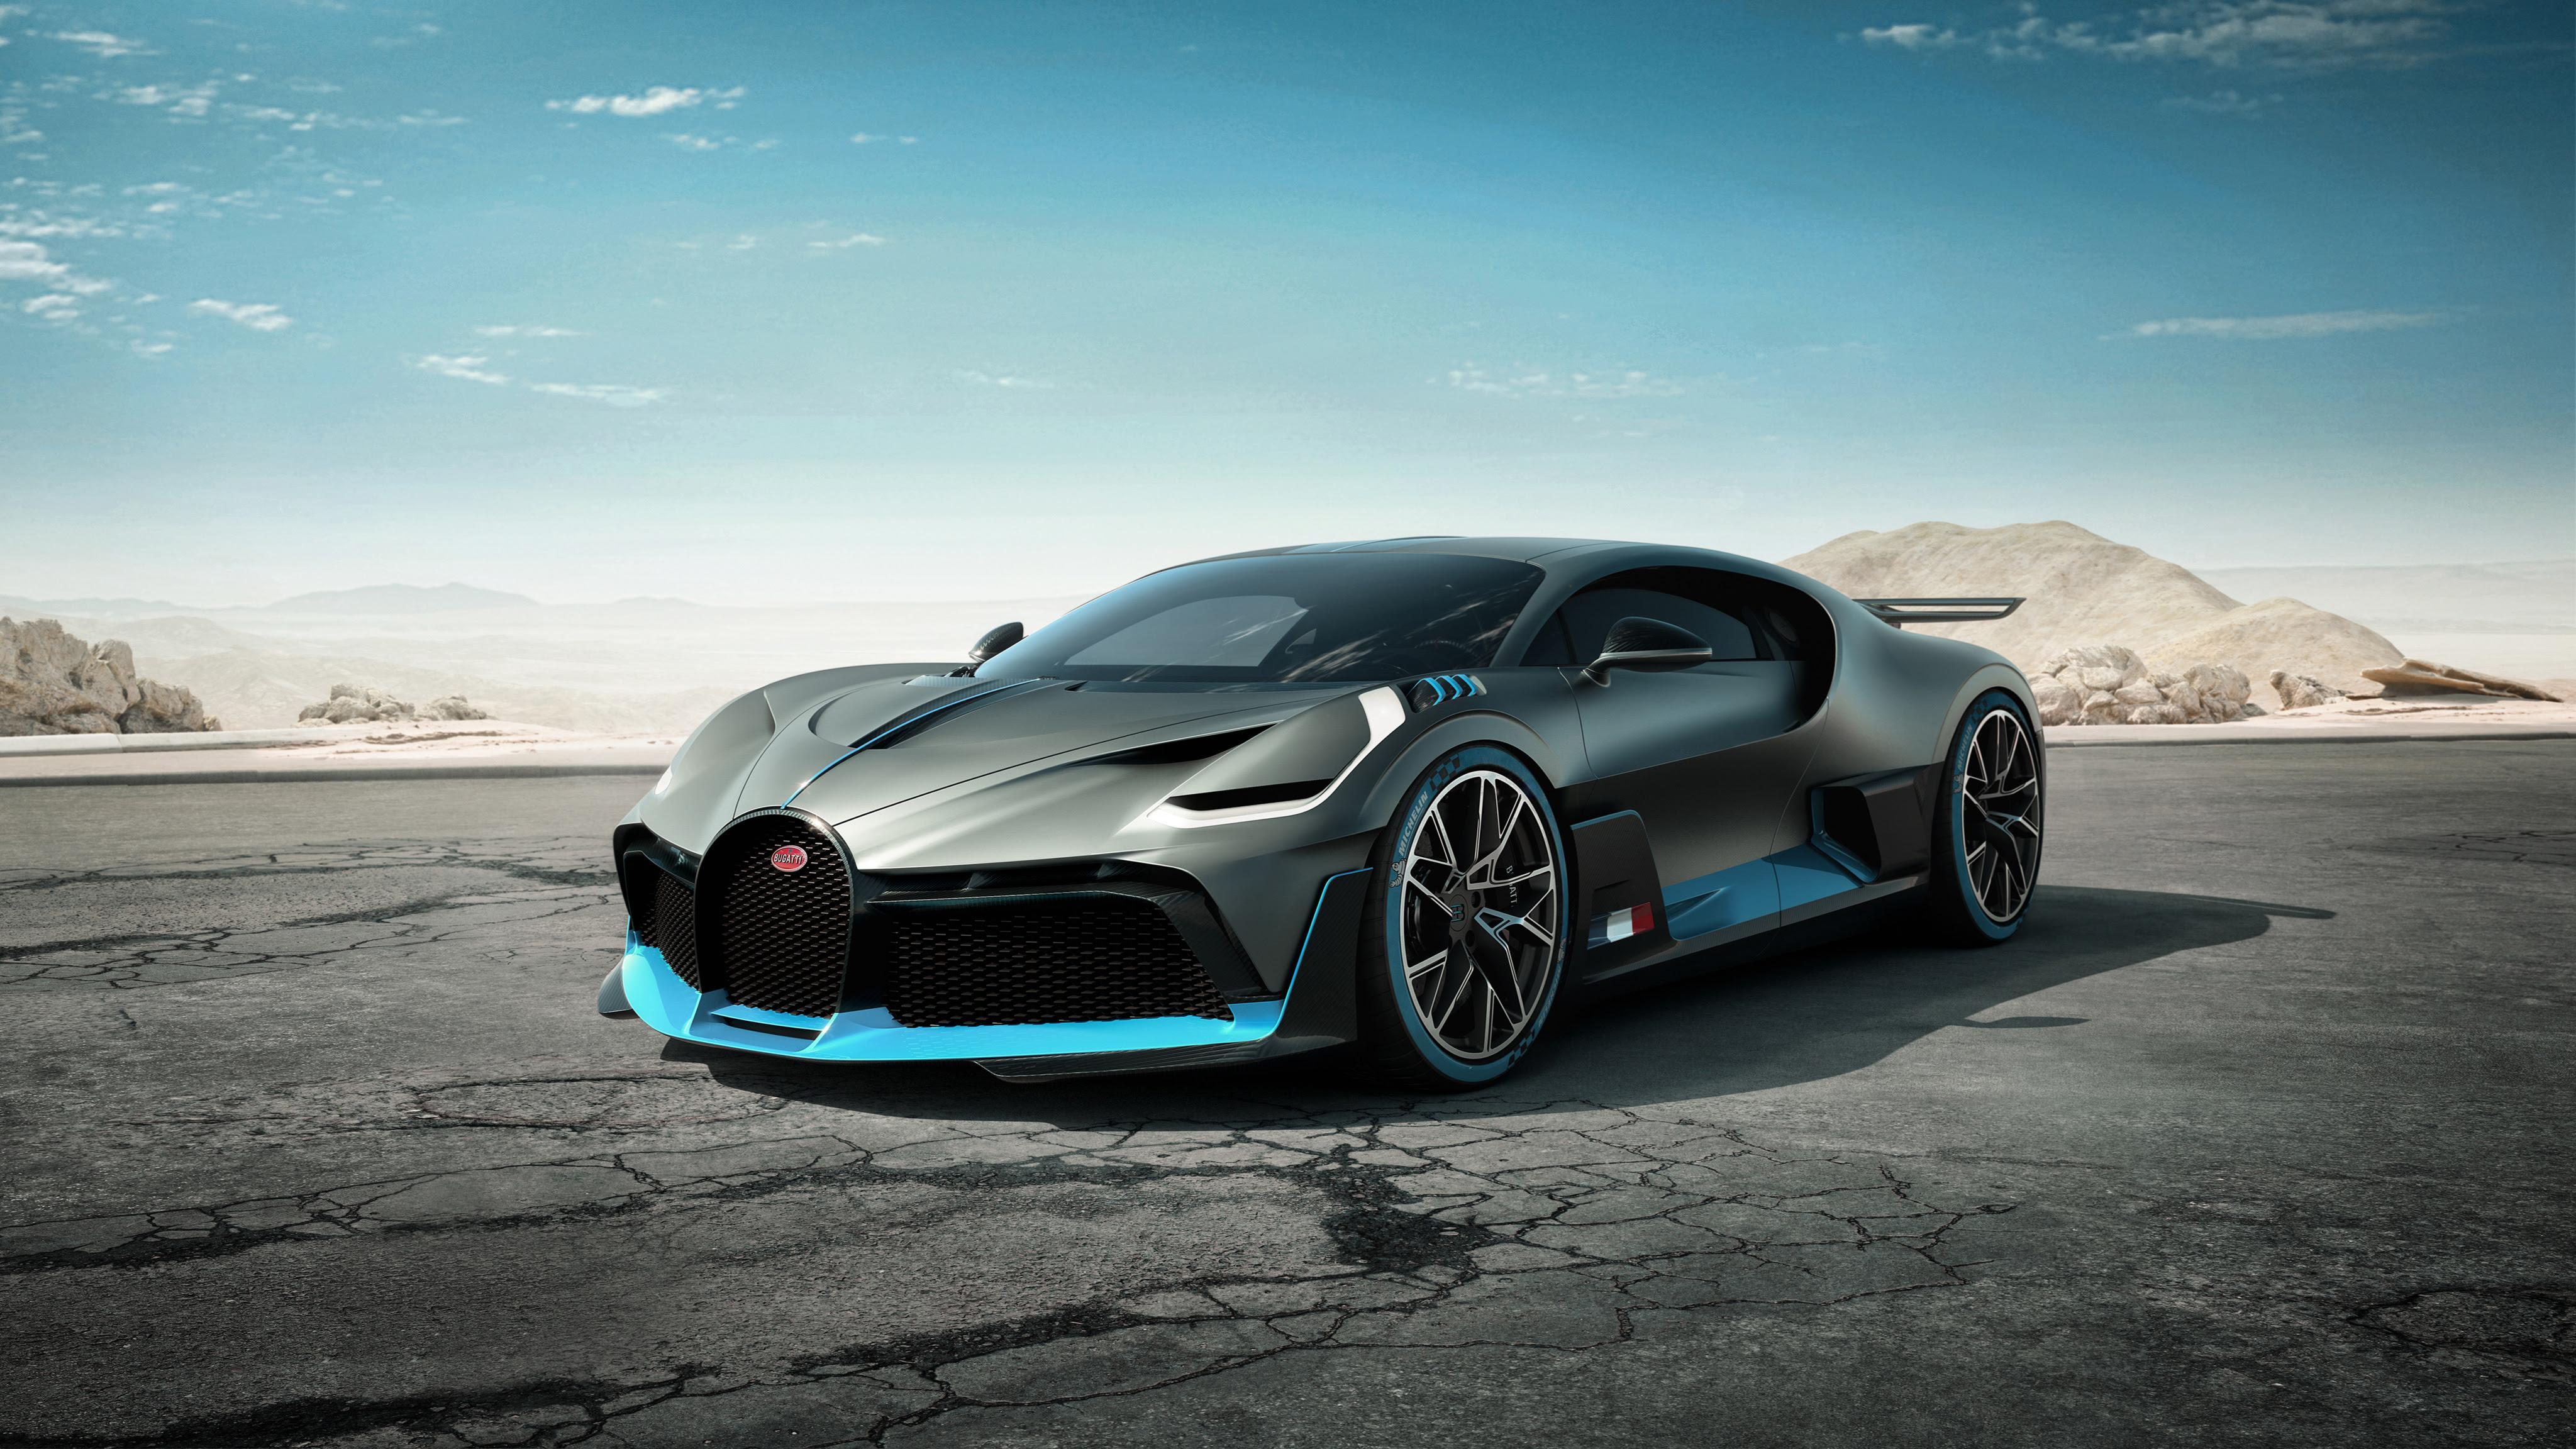 97+ Gambar Mobil Bugatti Veyron Super Sport HD Terbaru